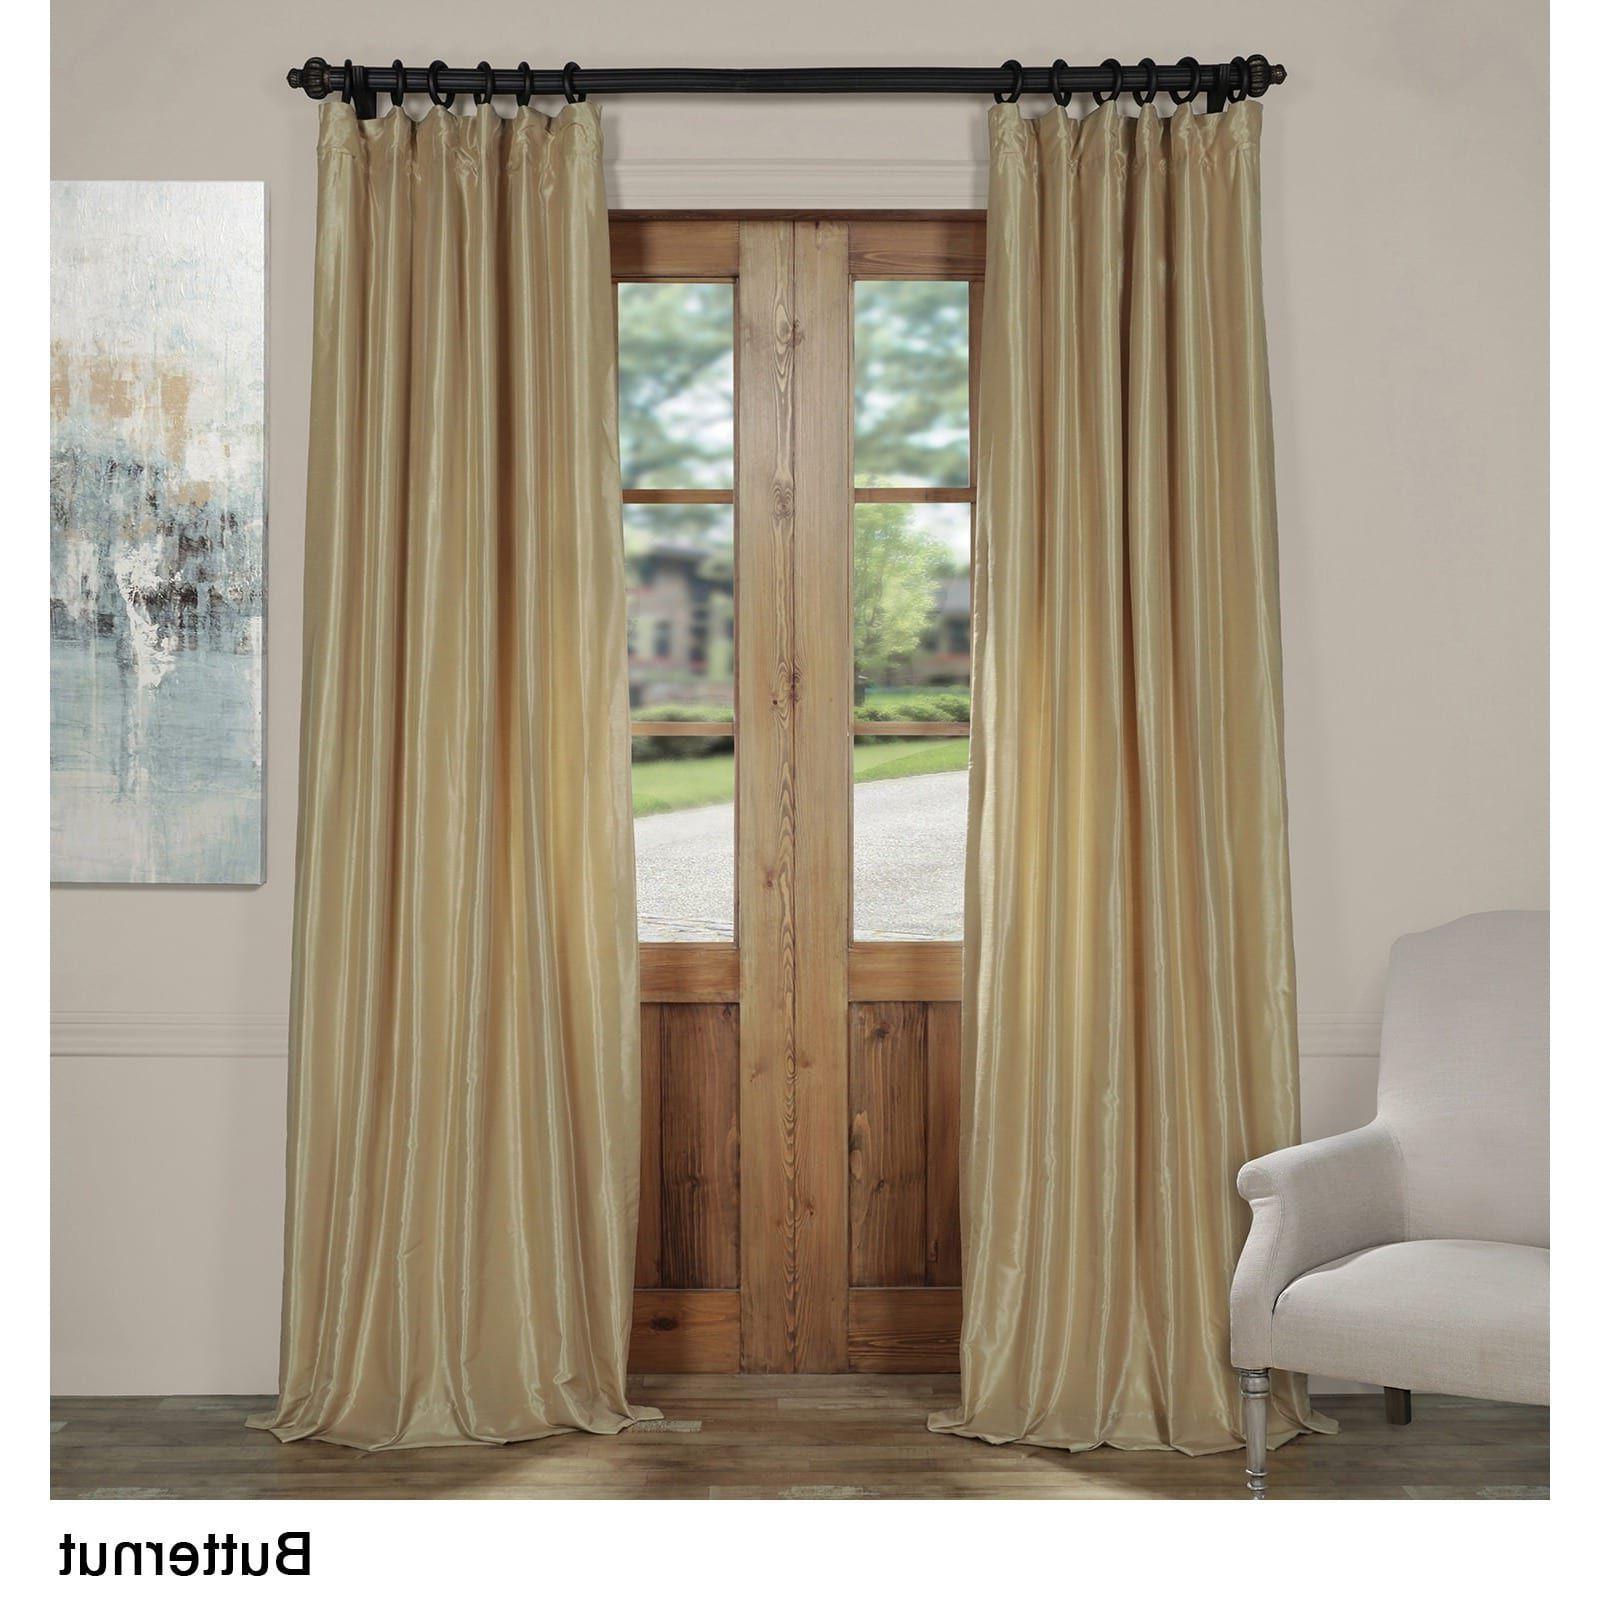 2020 Exclusive Fabrics Vintage Textured Faux Dupioni Silk Curtain With True Blackout Vintage Textured Faux Silk Curtain Panels (View 11 of 20)